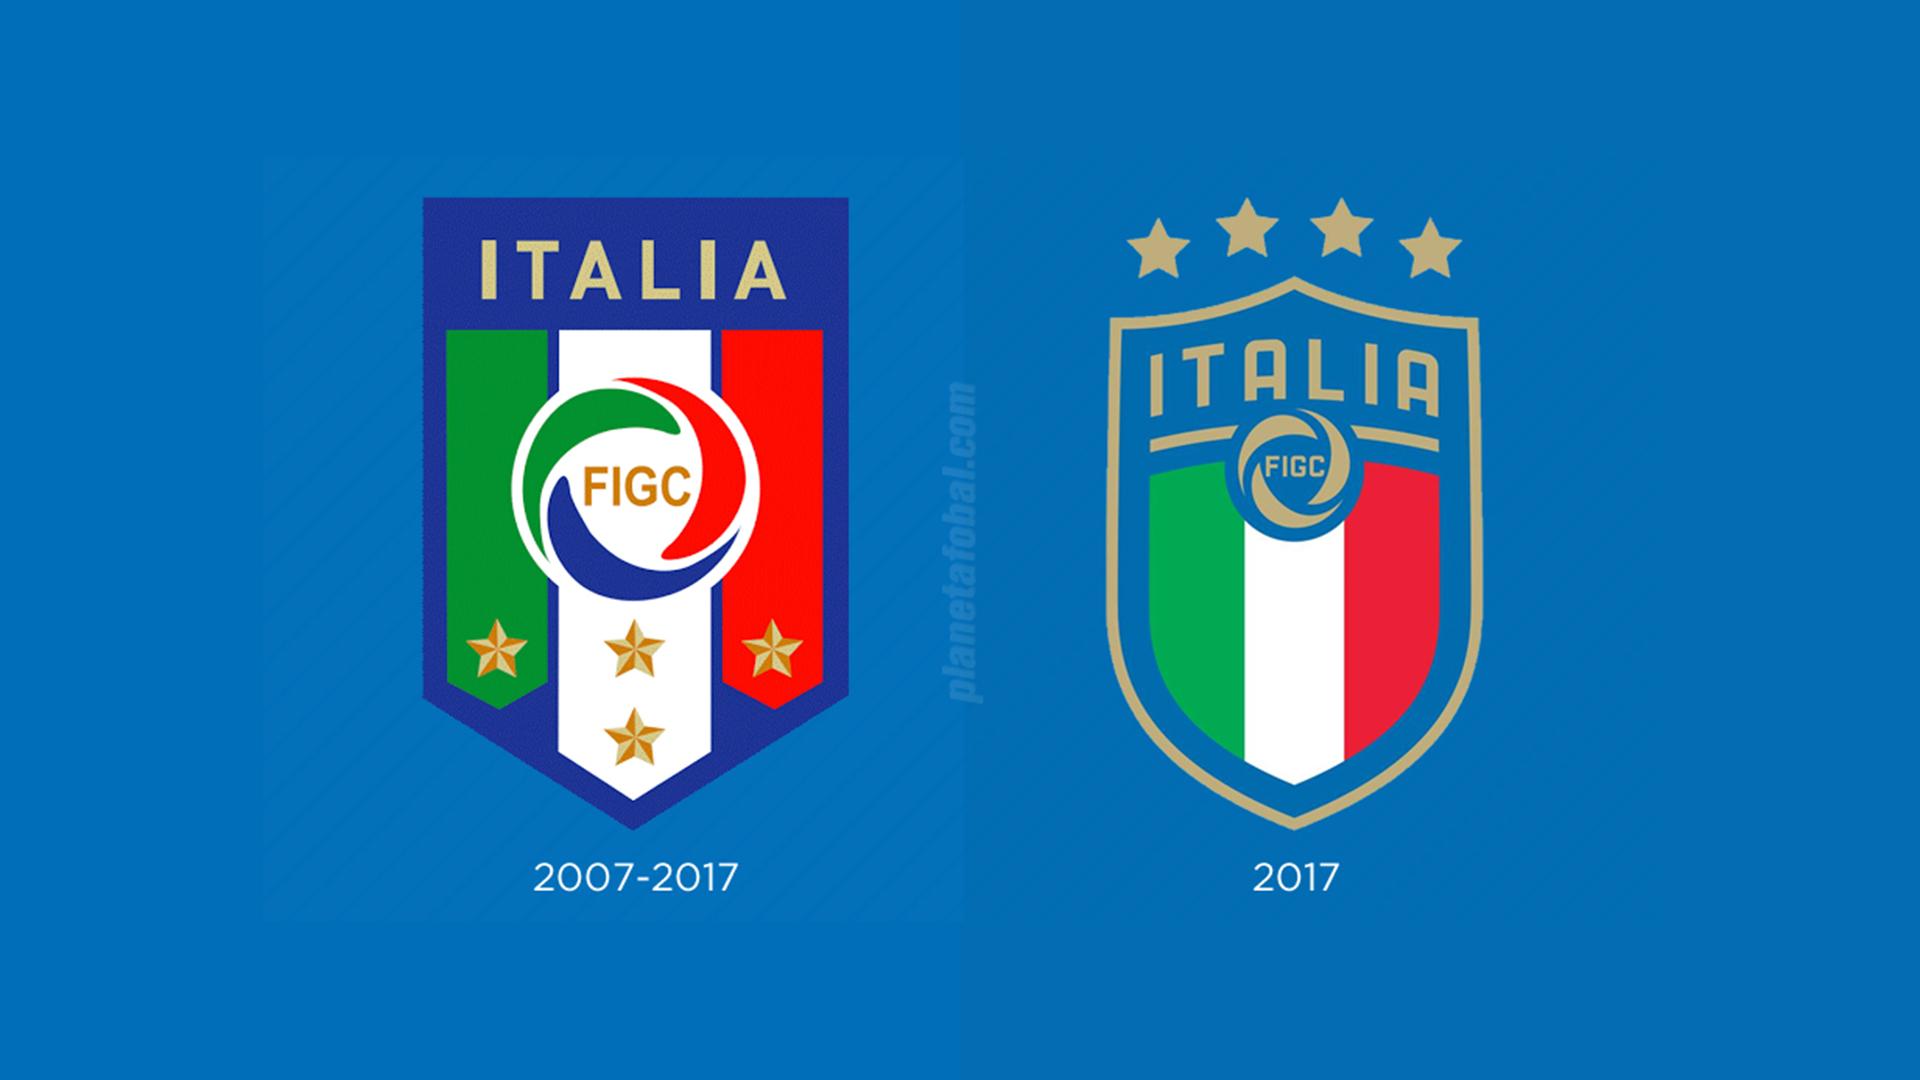 escudo-italia-1-apolo-blog